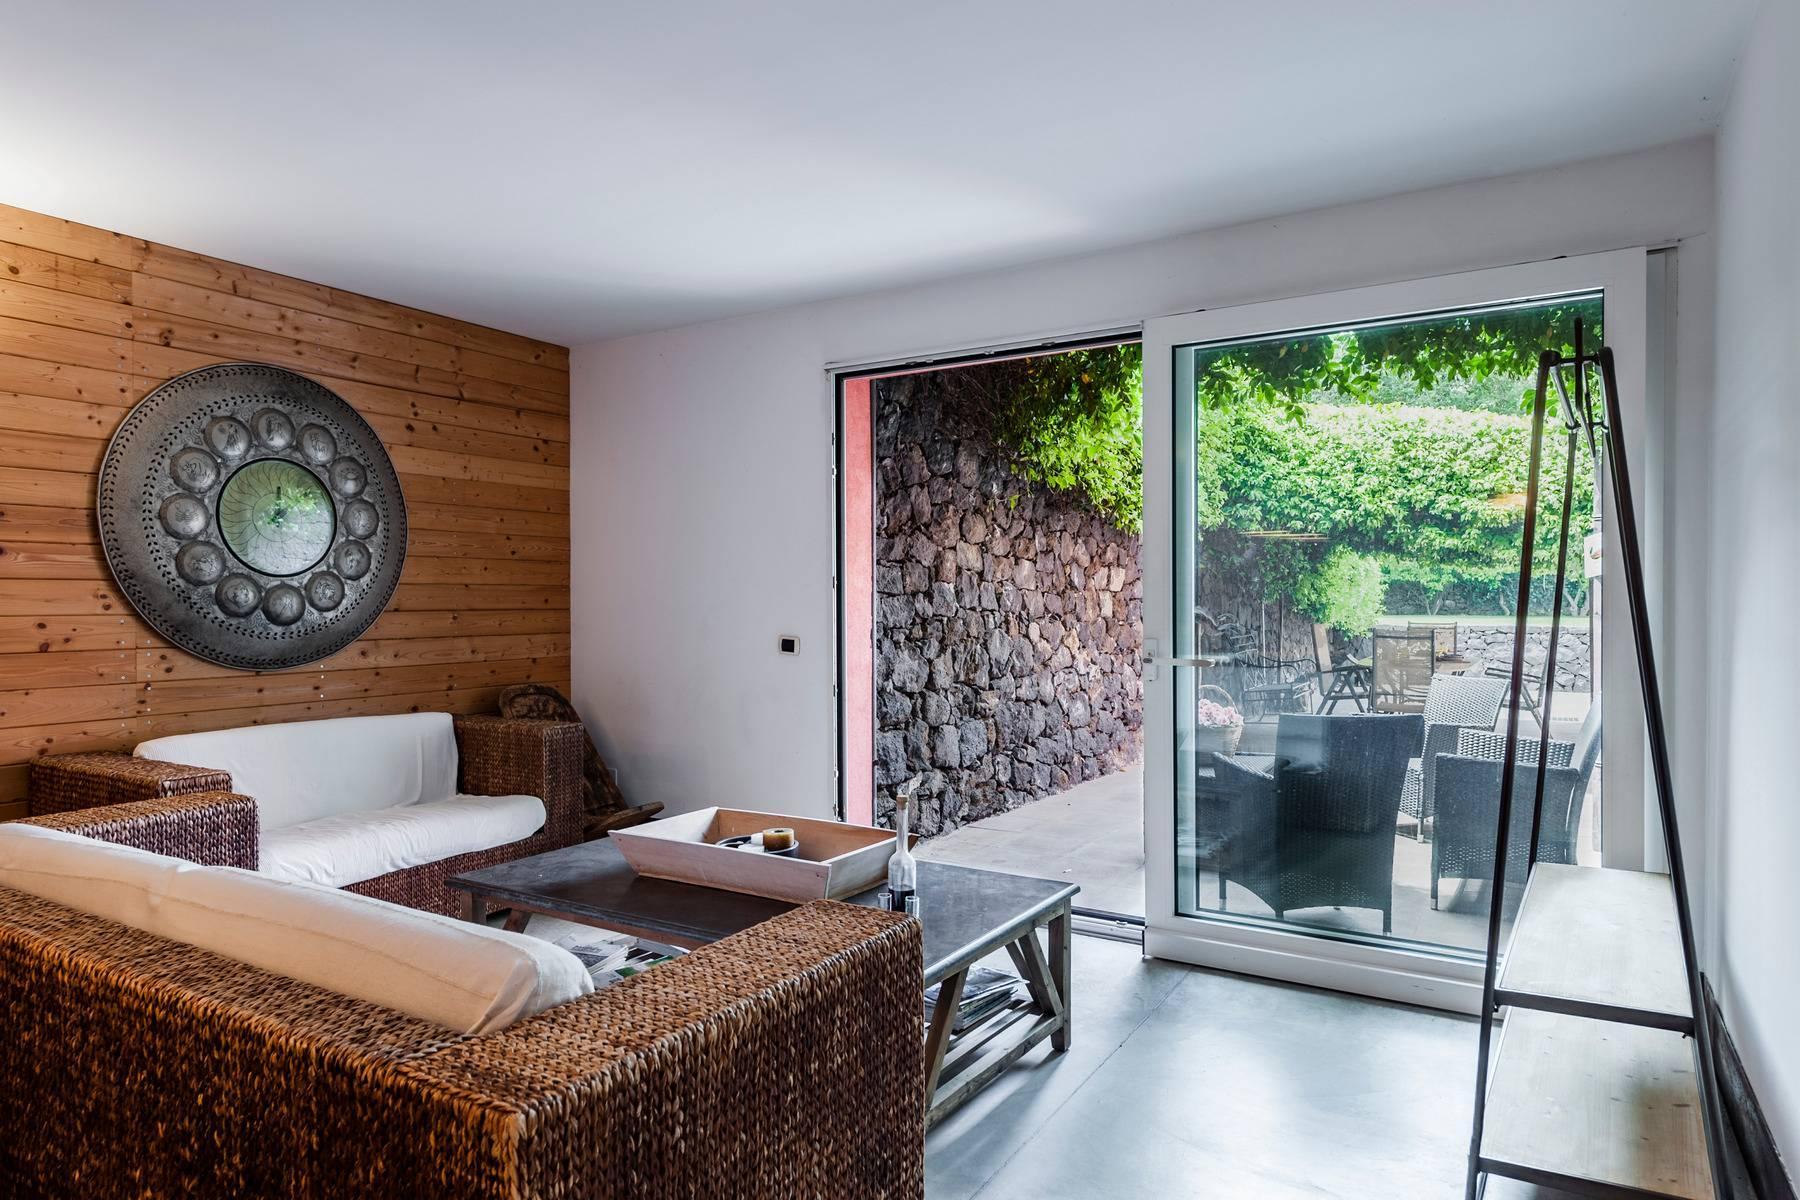 Villa esclusiva con piscina con vista ad Acireale - 10